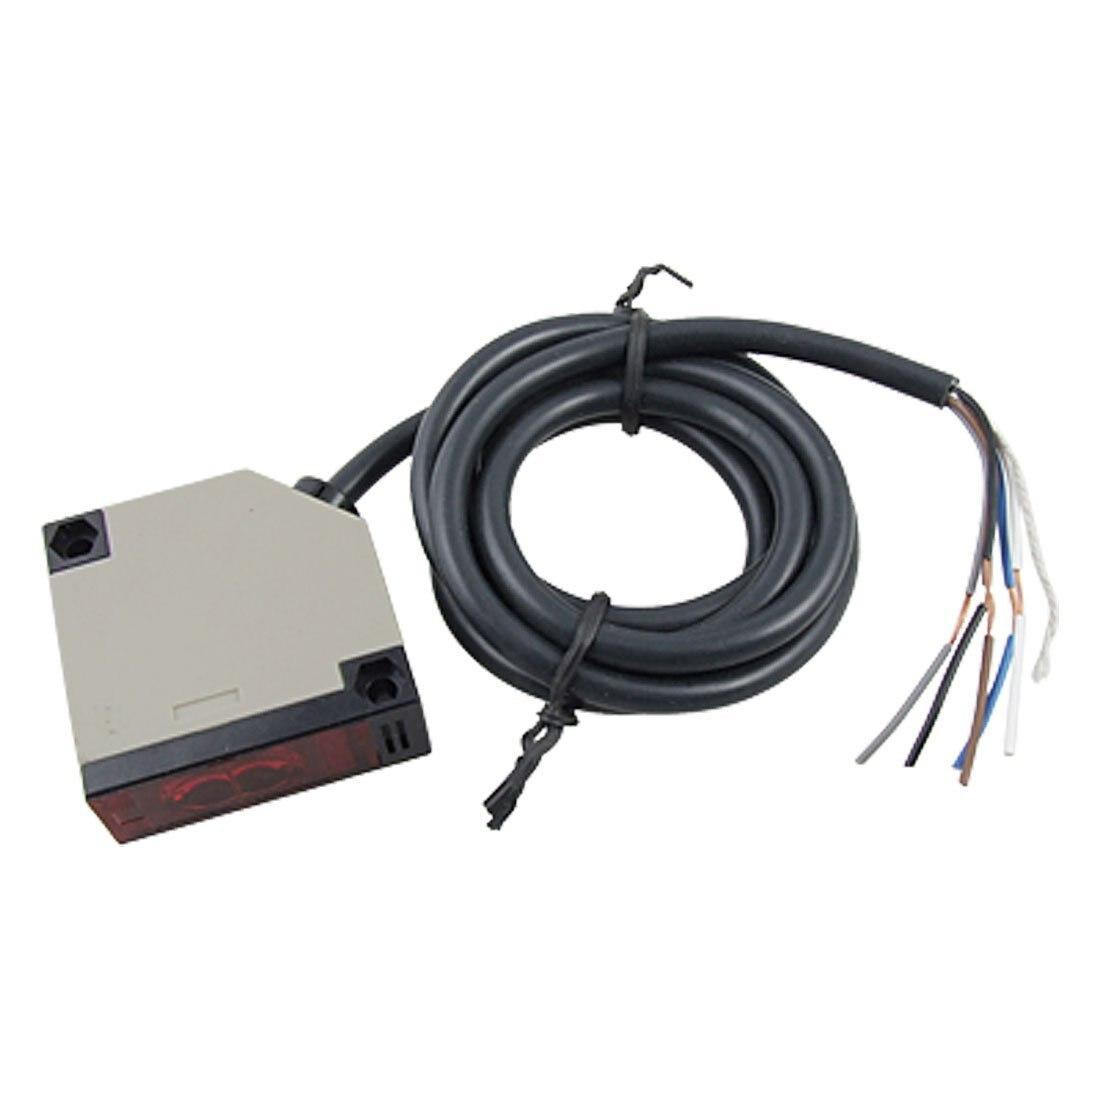 E3JK-R4M12 Retroreflective Photoelectric Switch Sensor w Reflector r e m r e m out of time 3 lp